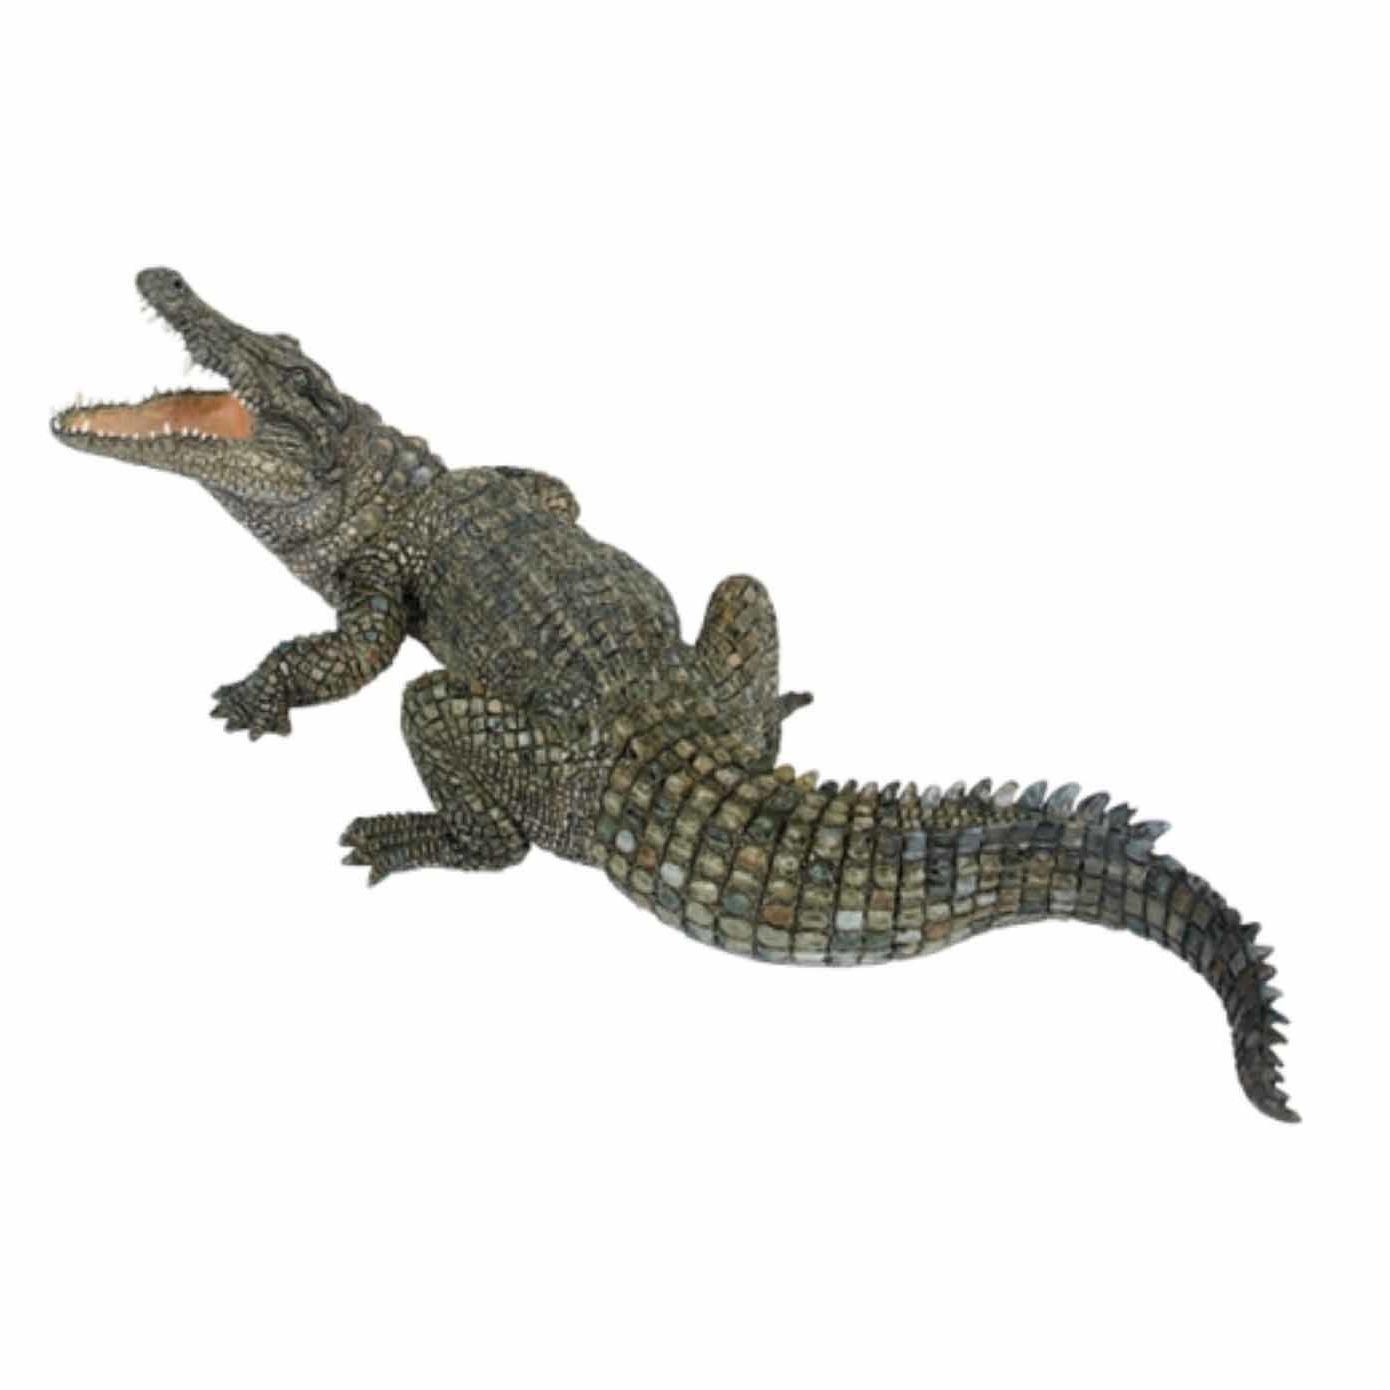 Plastic speelgoed figuur nijl krokodil 21 cm